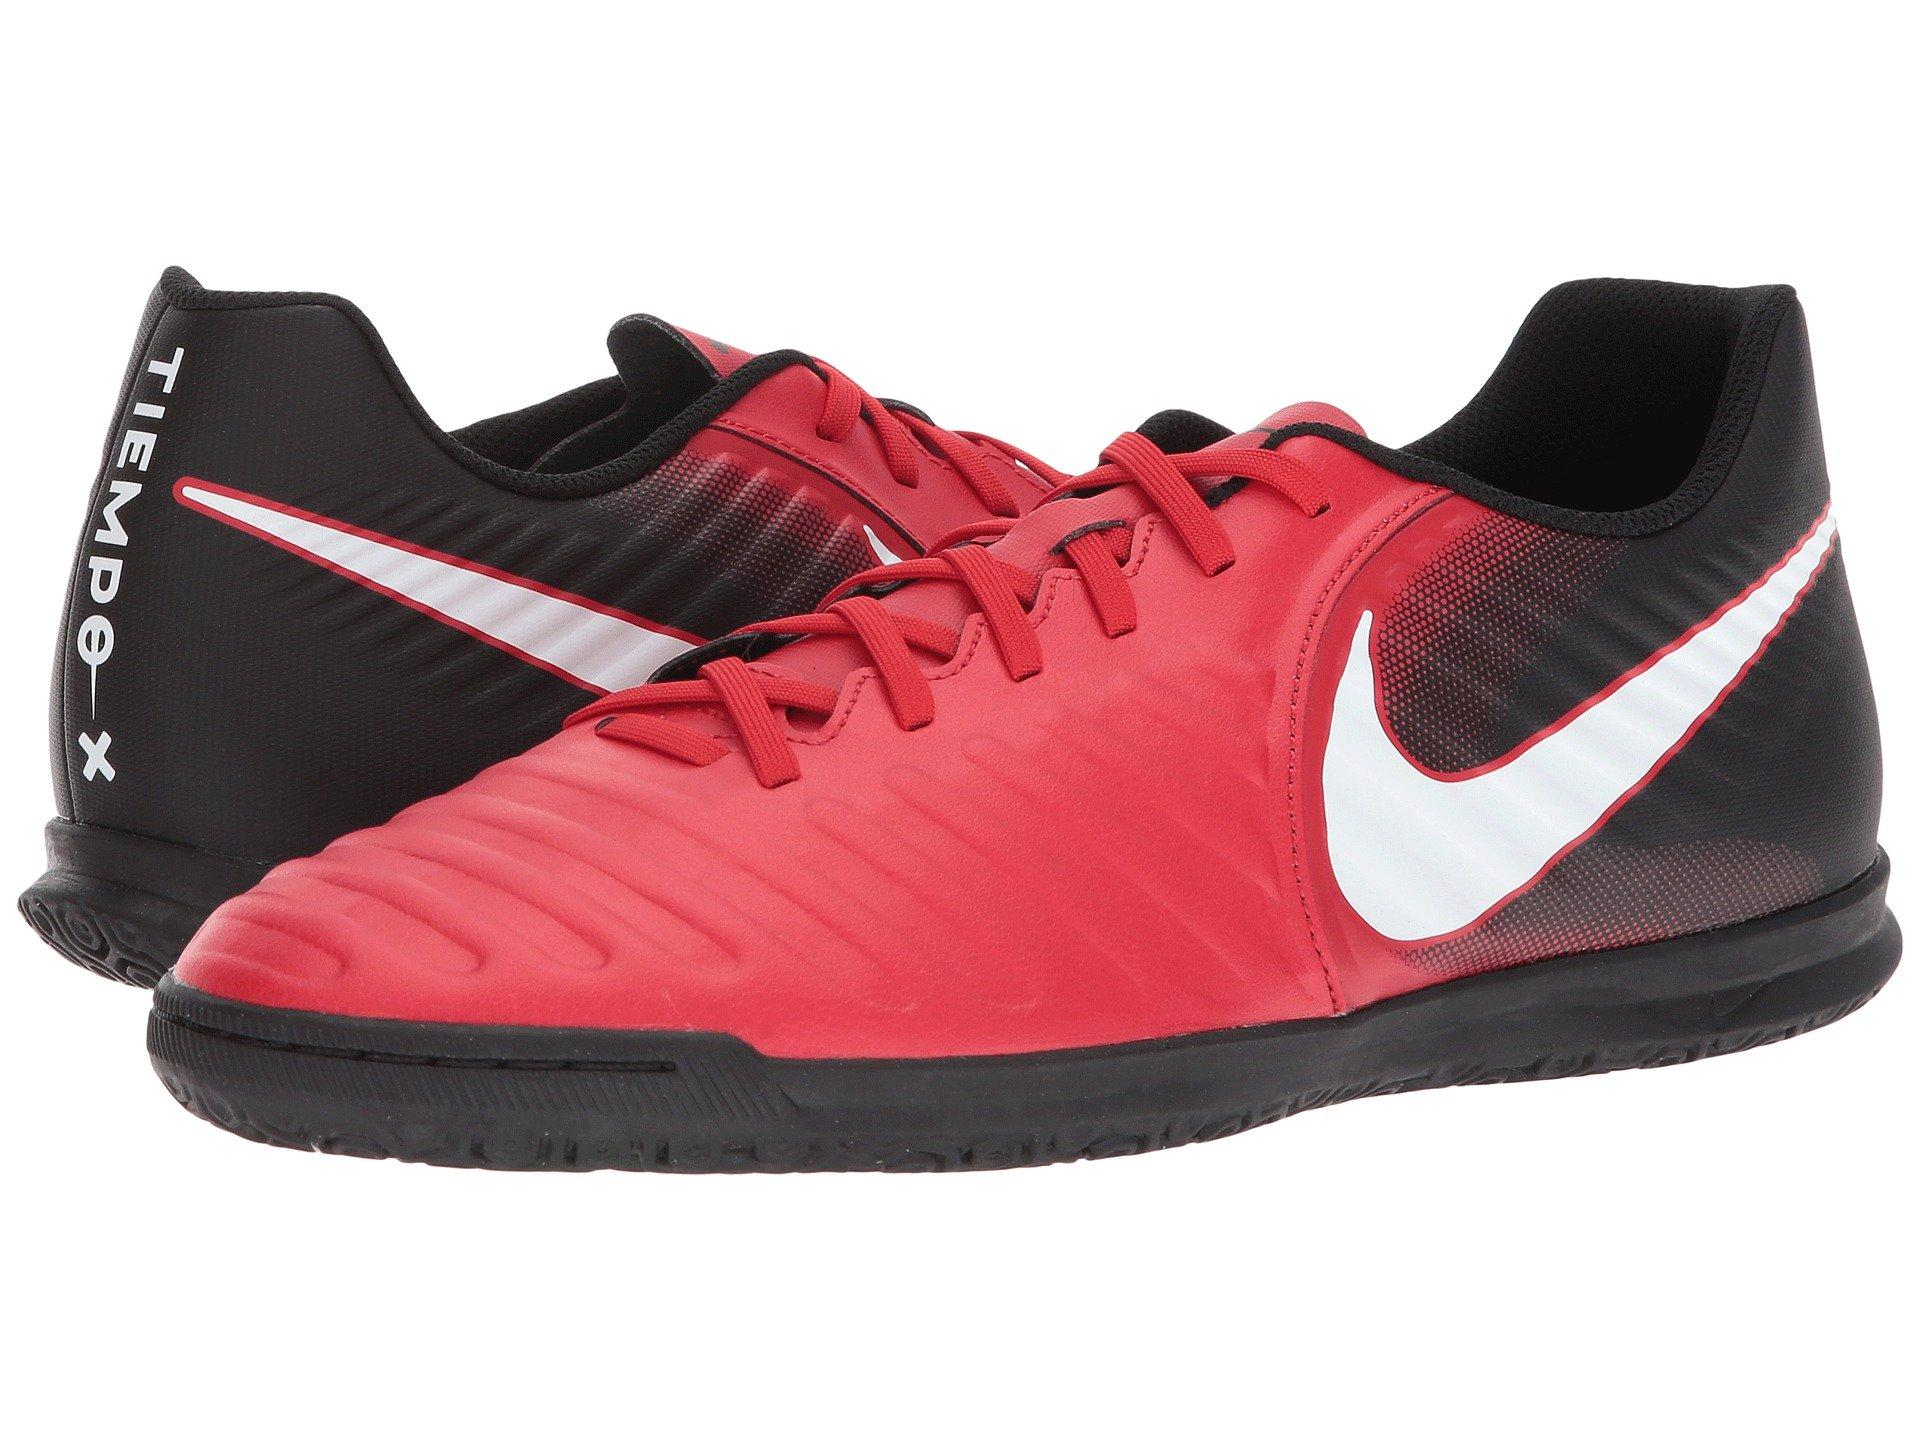 Nike Tiempox Rio Iv Ic In University Red/white/black